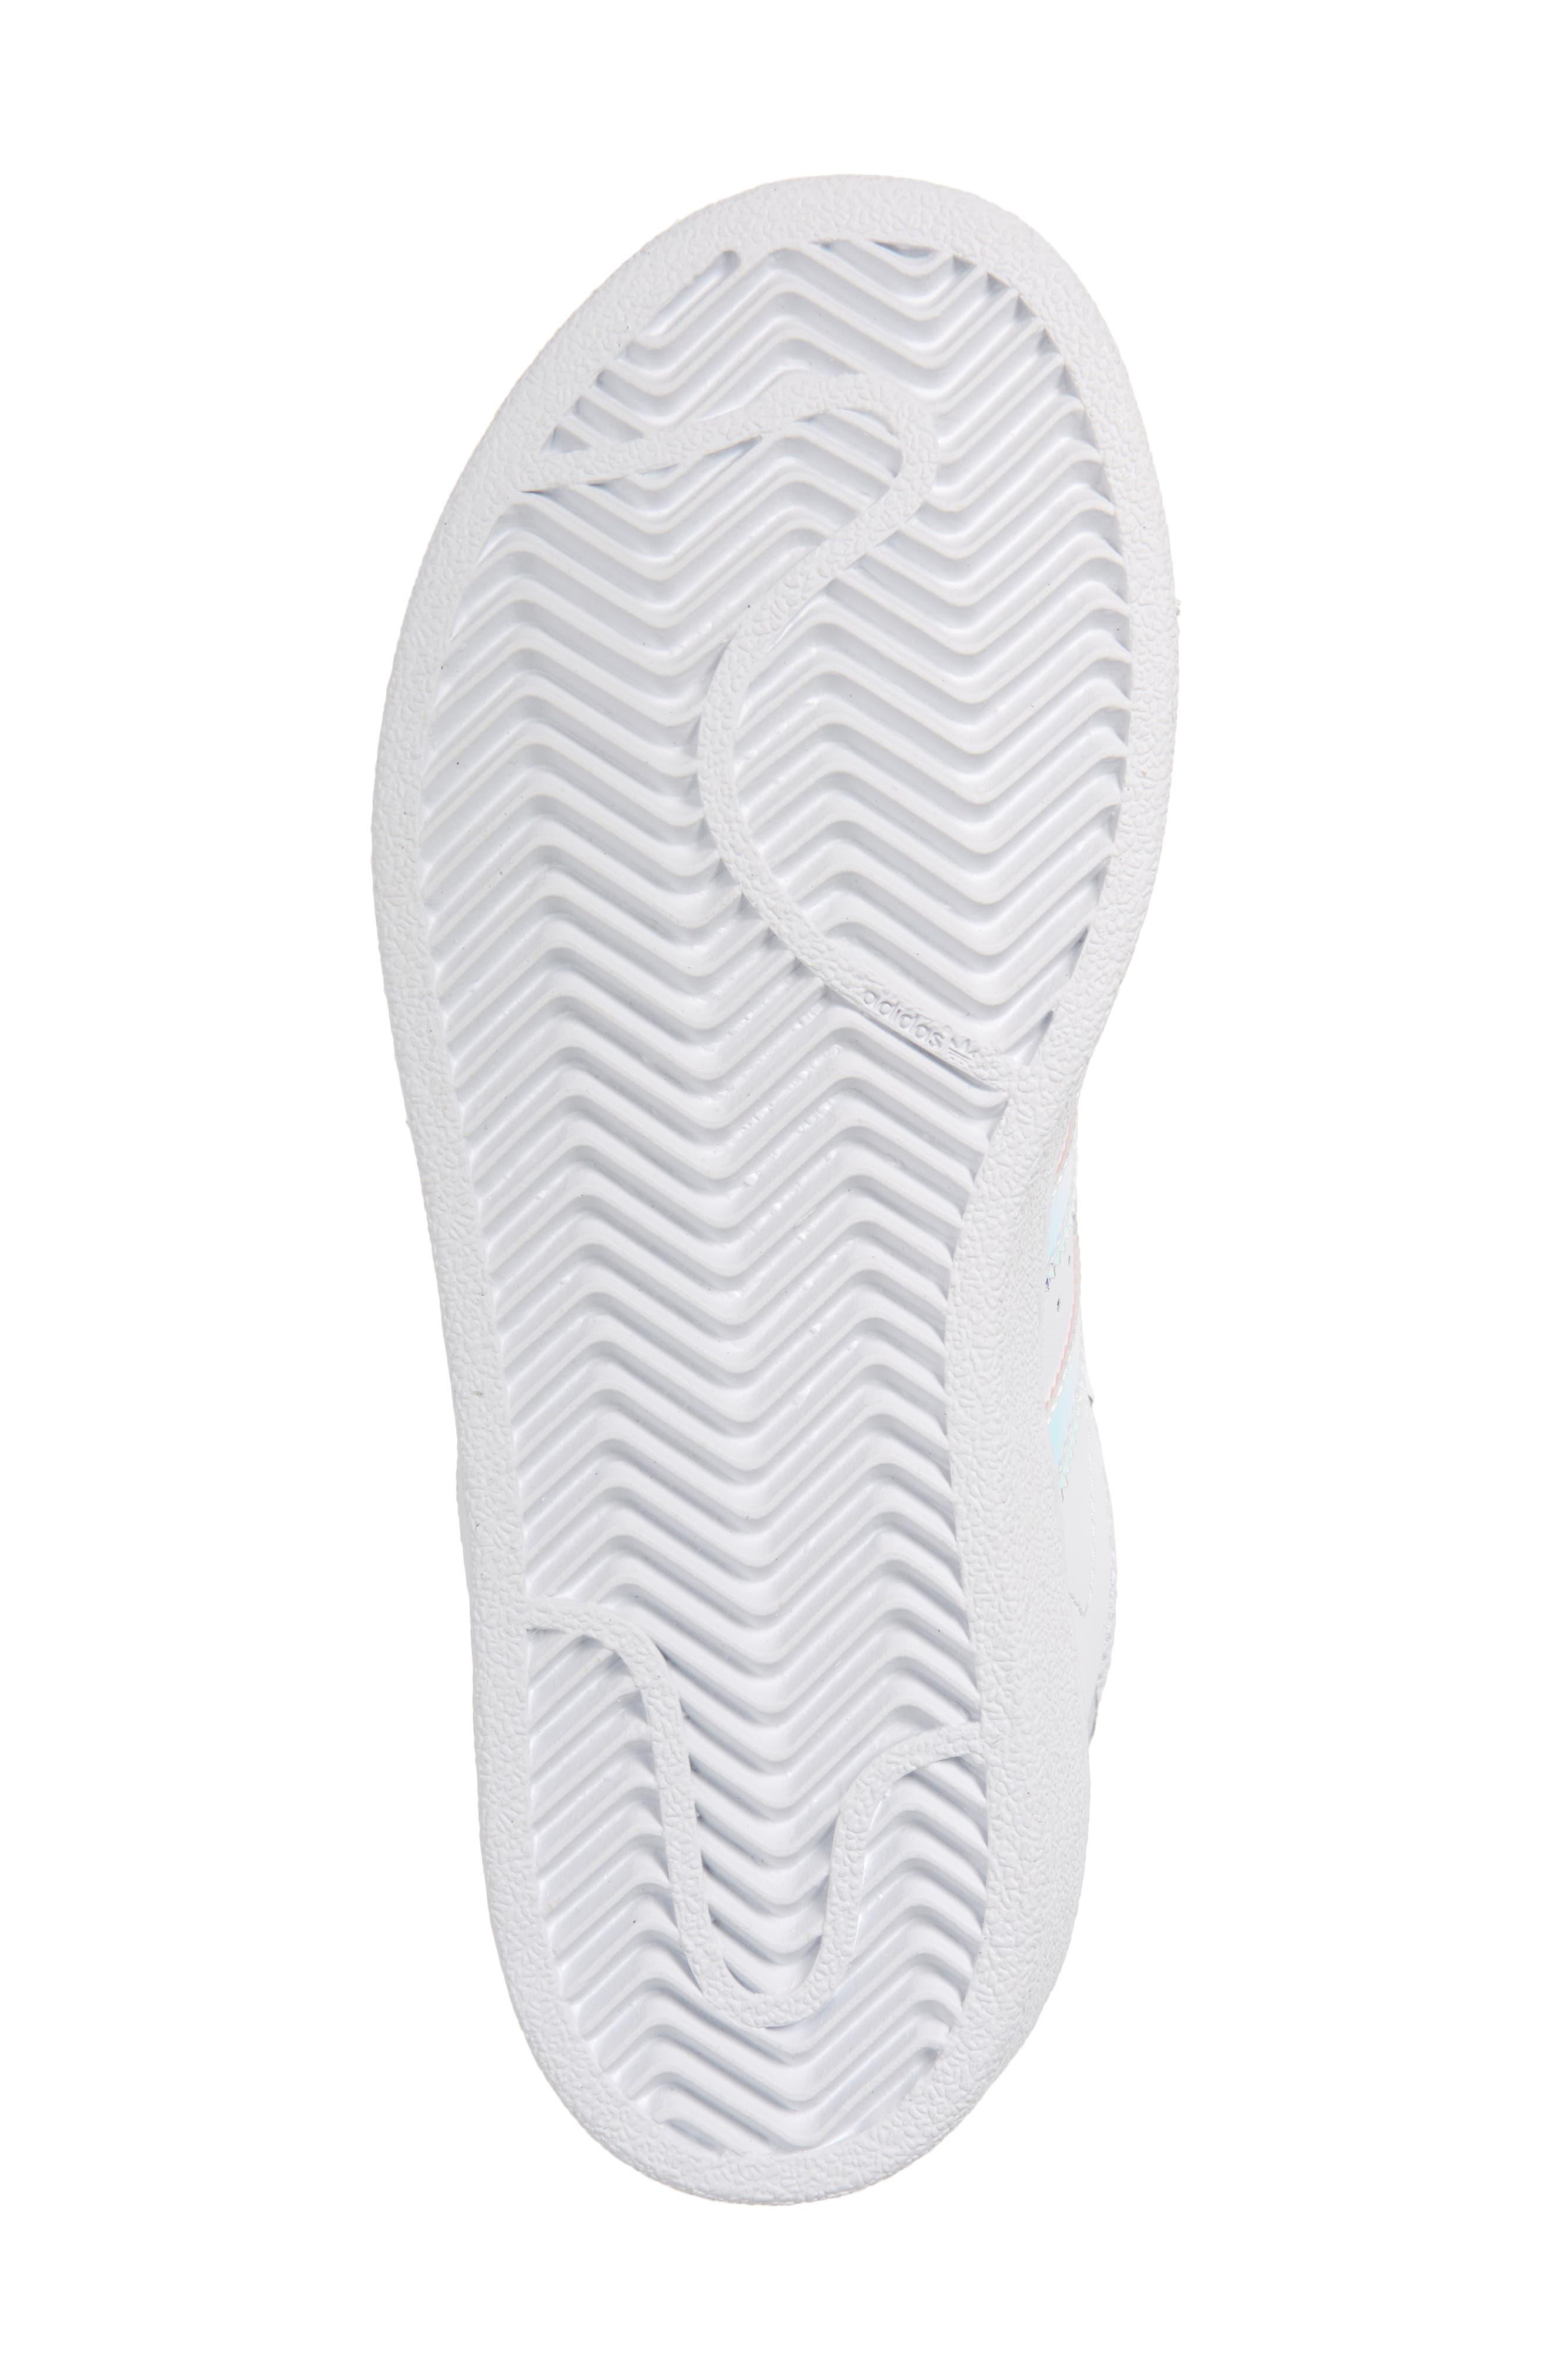 Superstar - Iridescent Sneaker,                             Alternate thumbnail 7, color,                             SILVER METALLIC/ WHITE